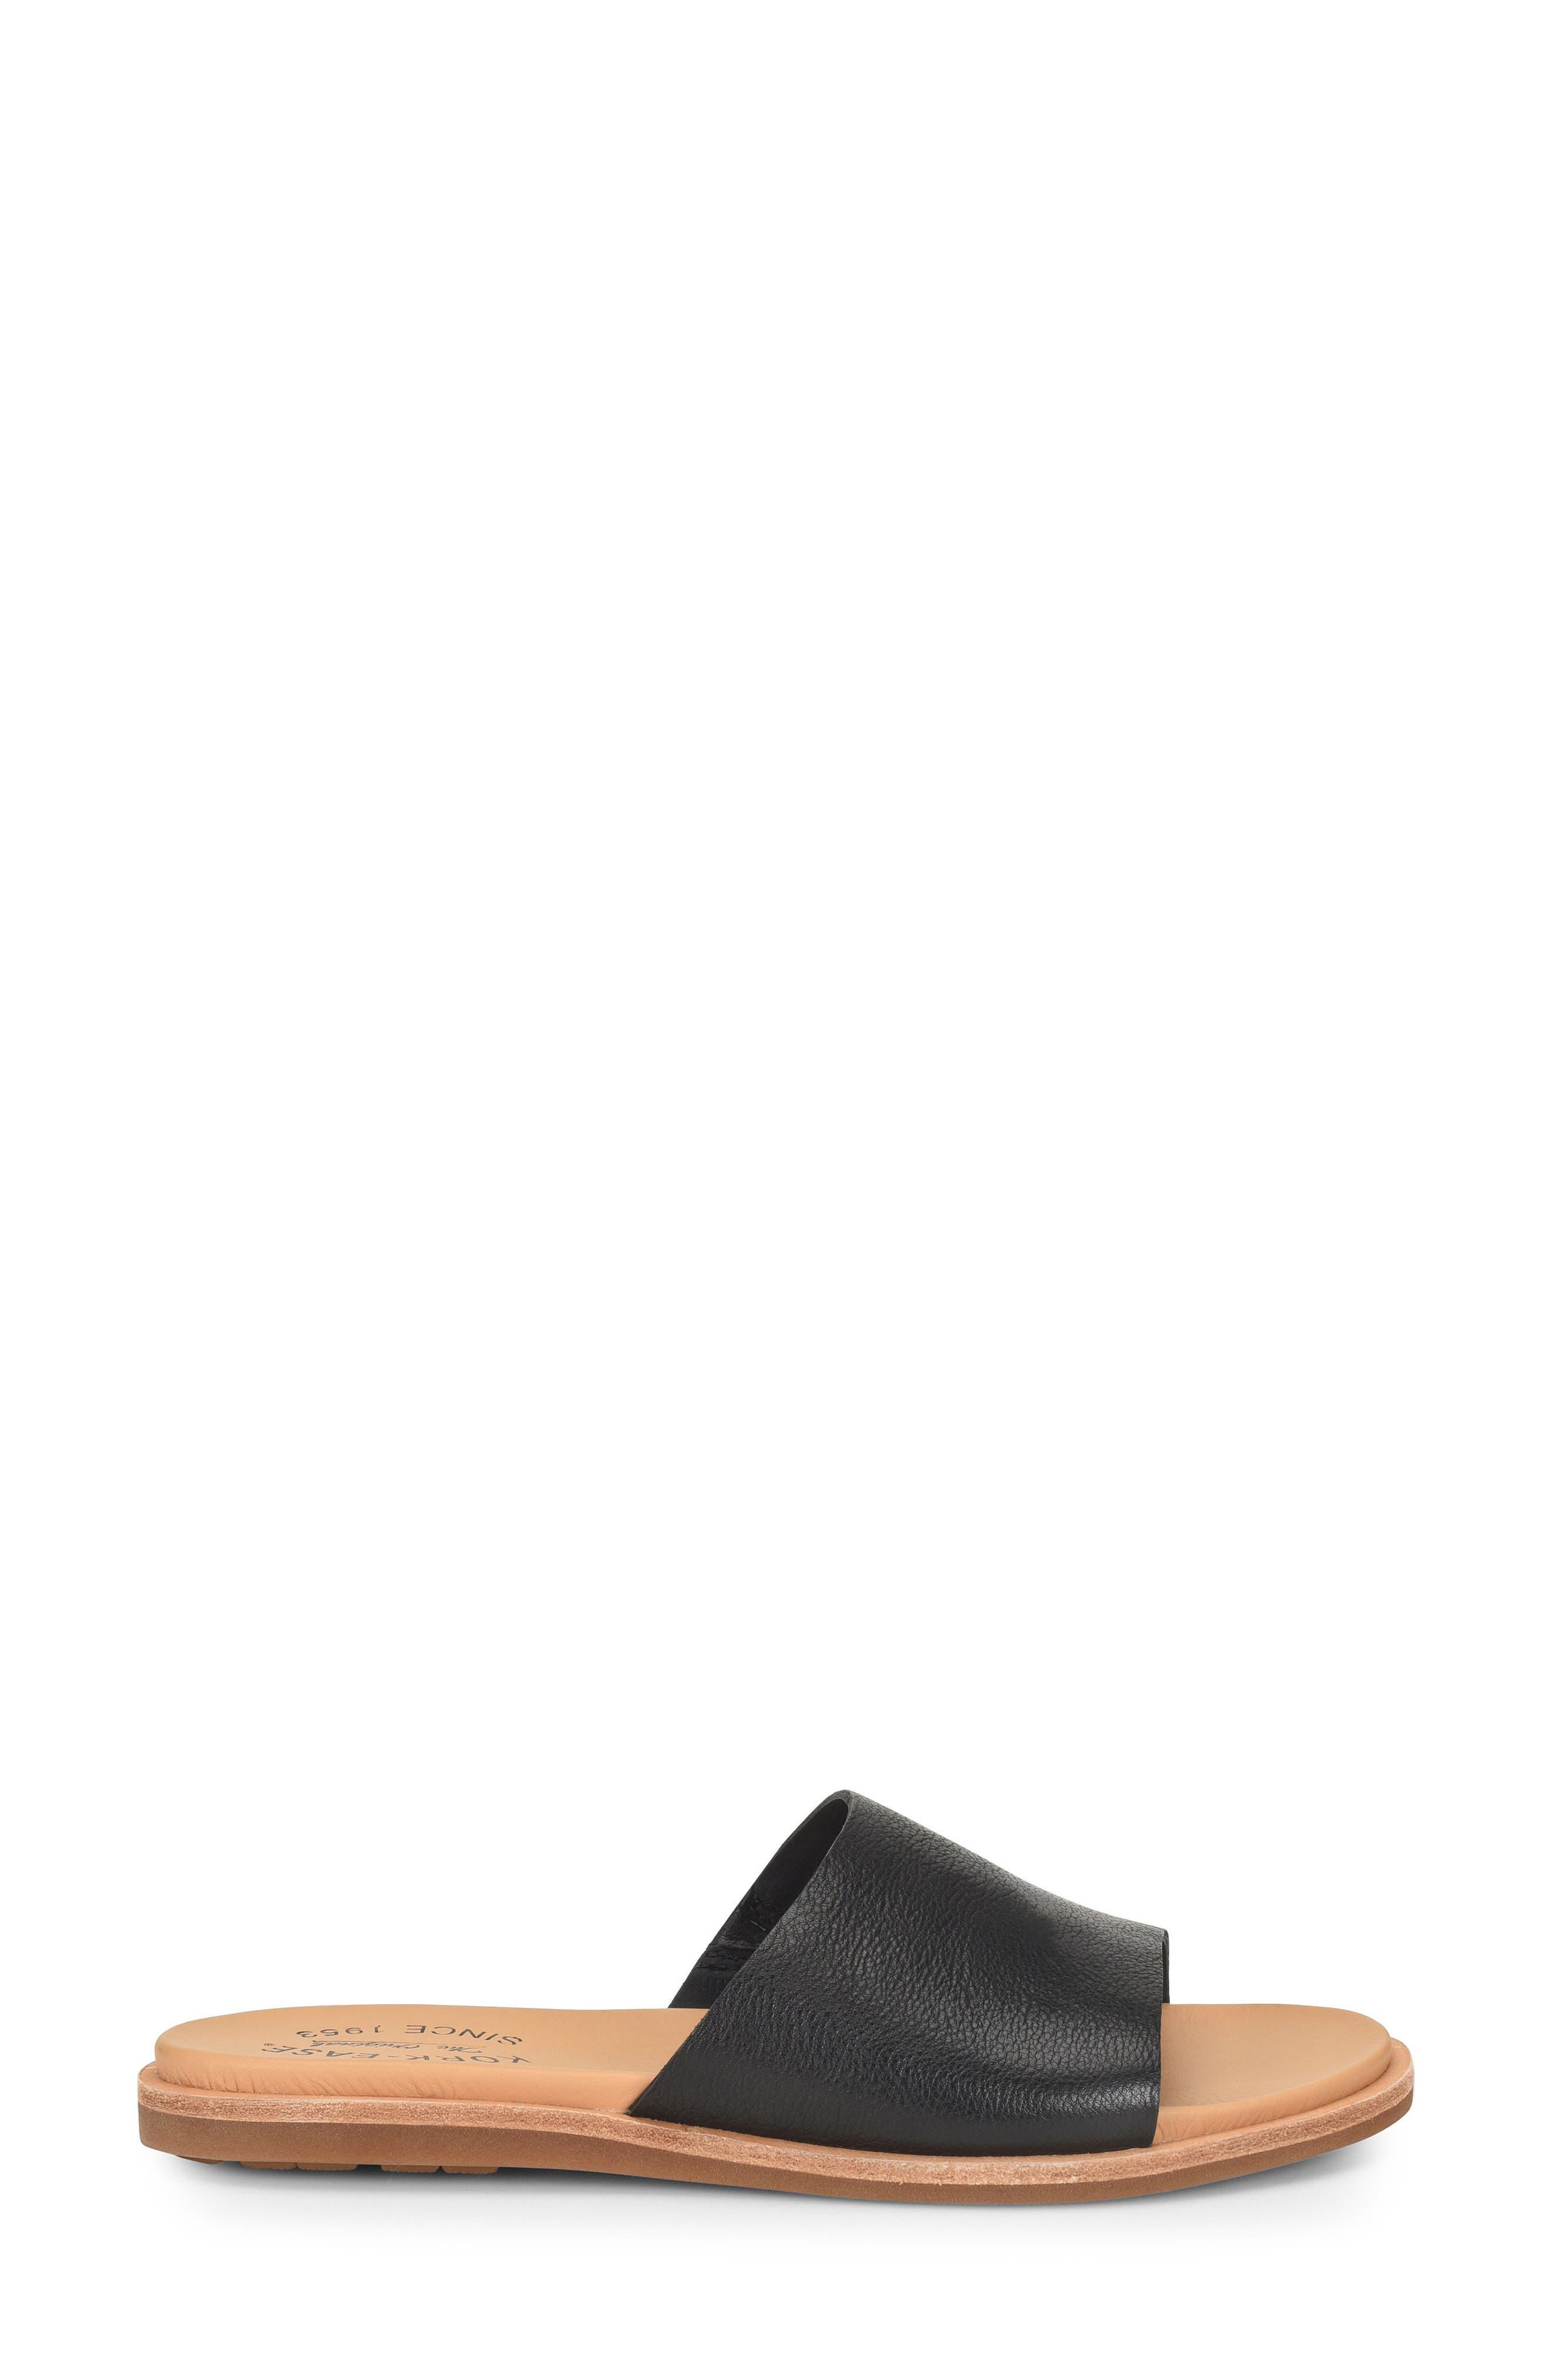 Gila Slide Sandal,                             Alternate thumbnail 3, color,                             BLACK LEATHER